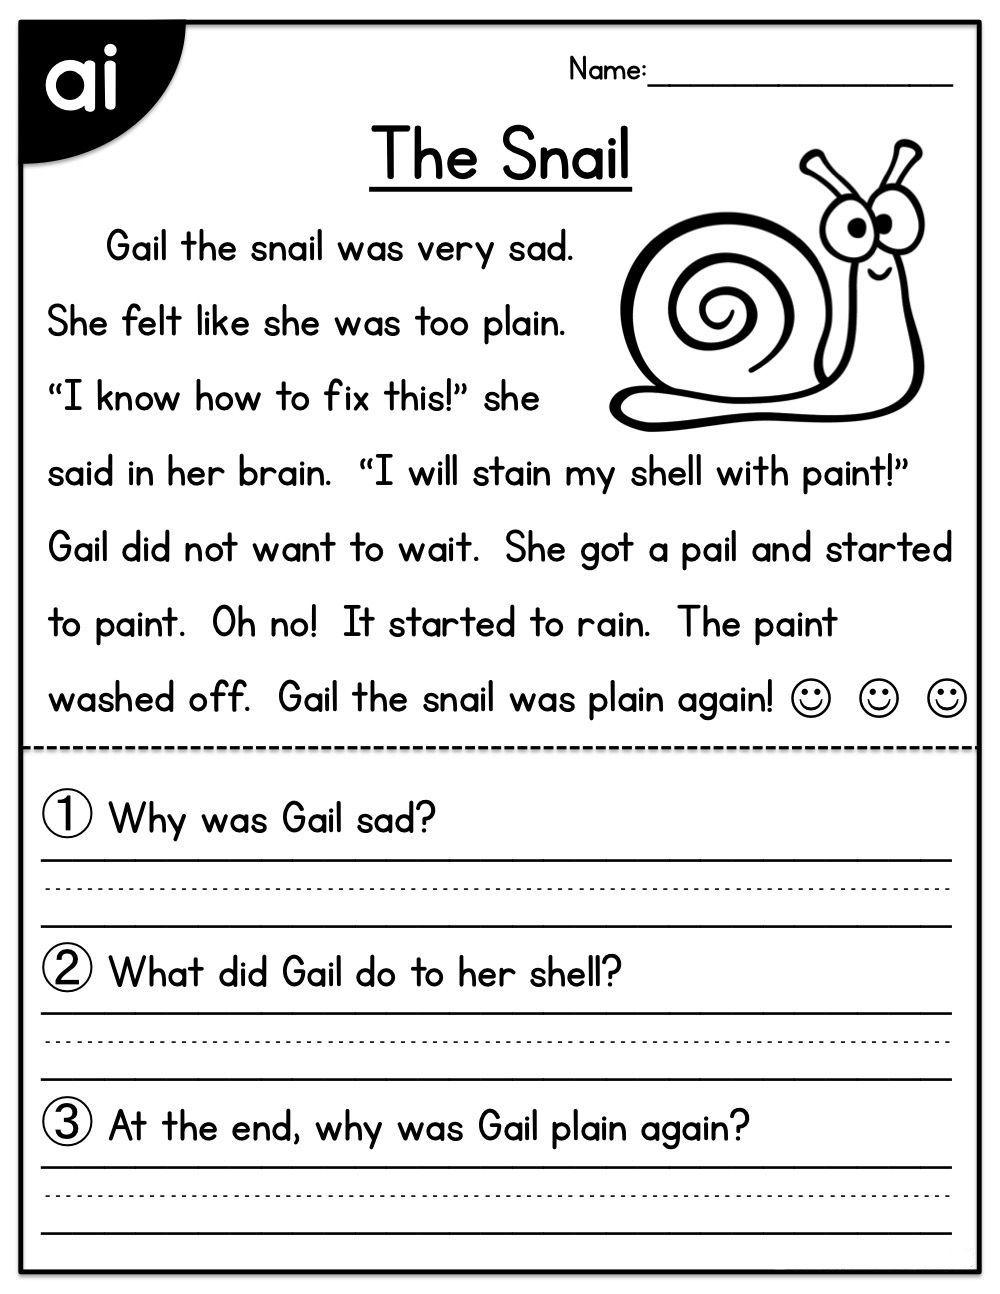 2nd Grade Reading Worksheets Best Coloring Pages For Kids 2nd Grade Reading Worksheets 2nd Grade Reading Comprehension Reading Comprehension Worksheets 2nd grade reading passage with